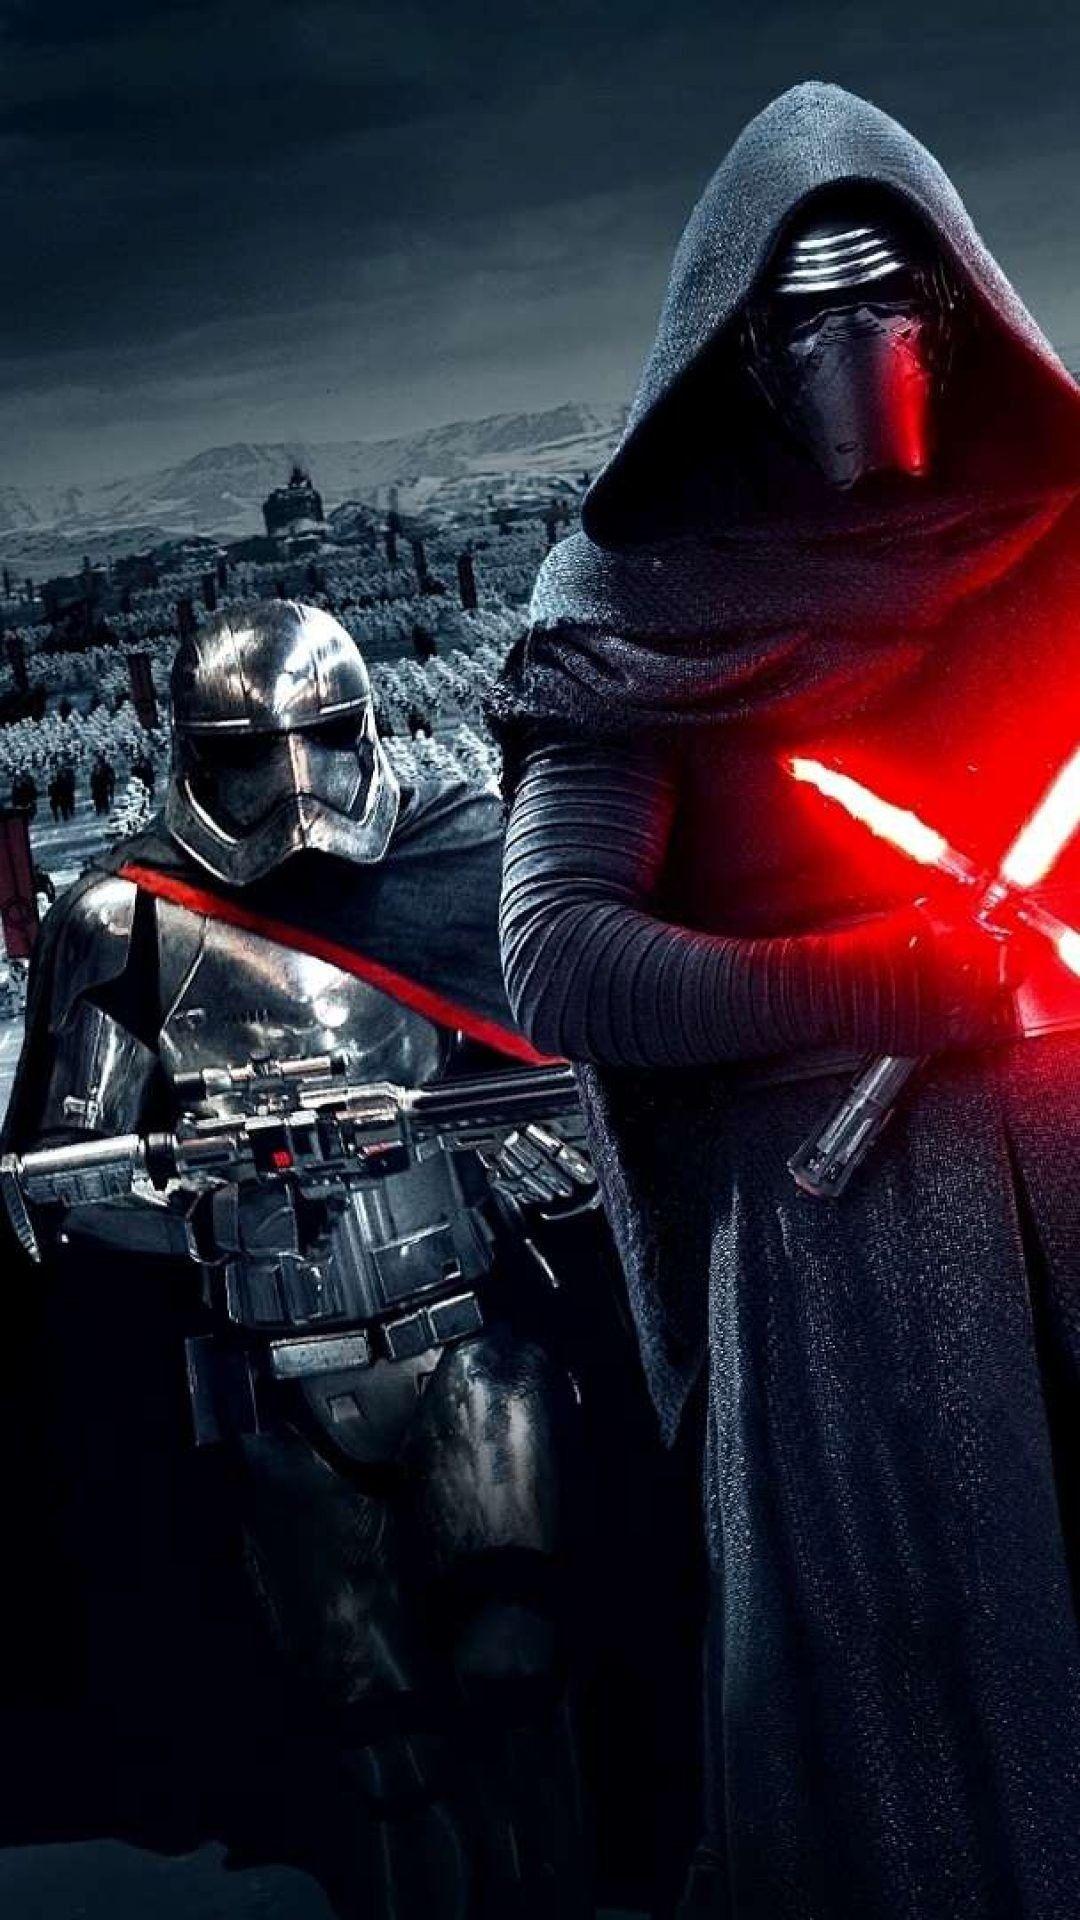 Jedi Star Wars Wallpaper Home Screen In 2020 Star Wars Wallpaper Star Wars Villains Ren Star Wars